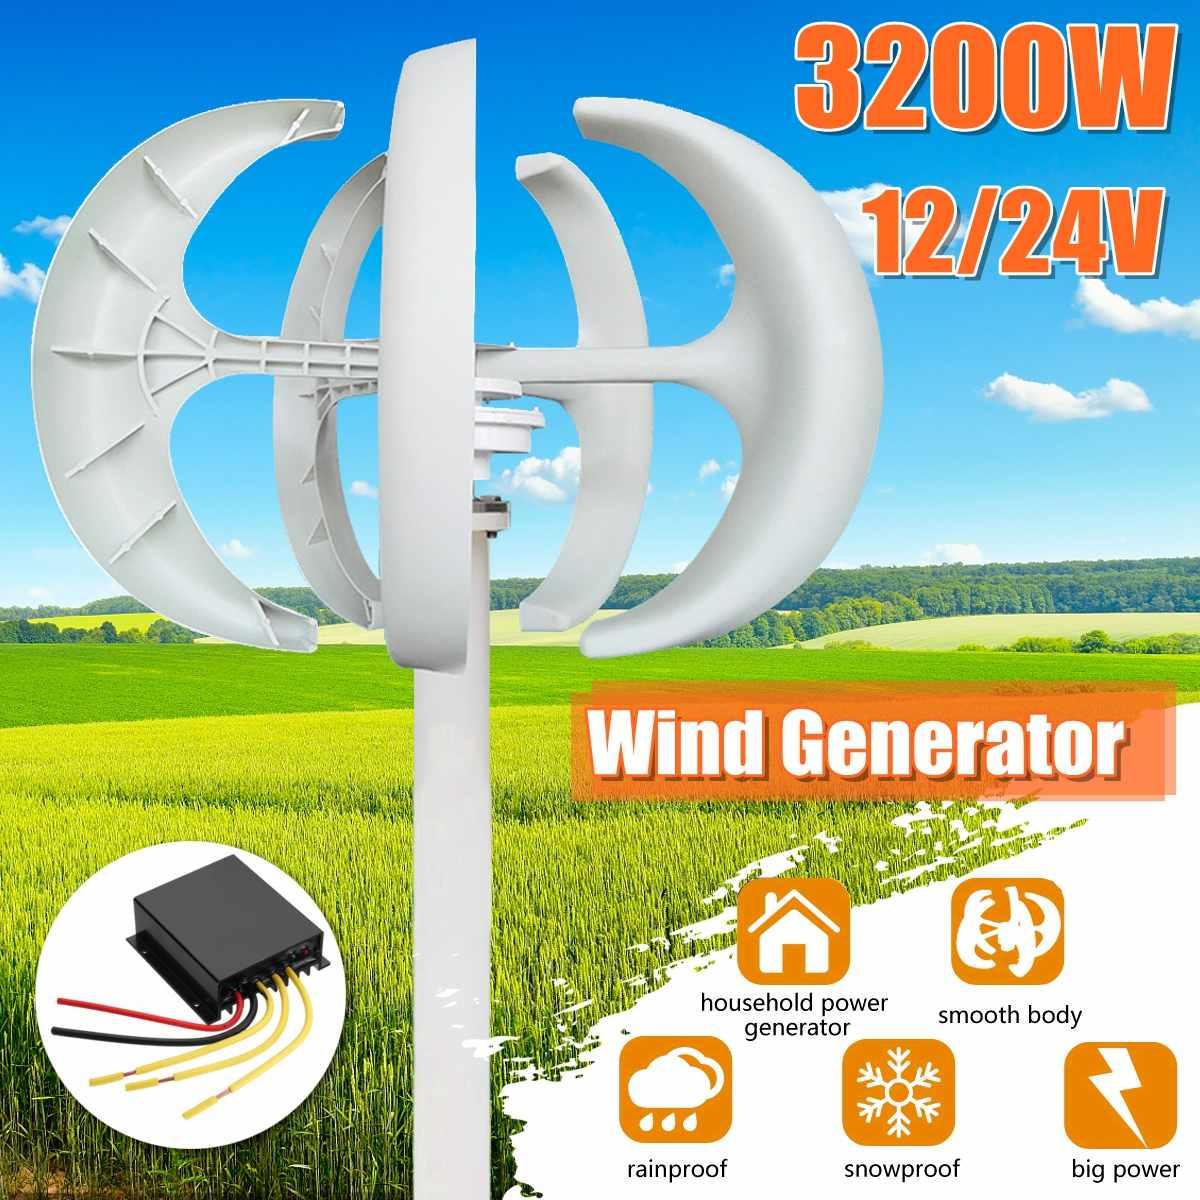 3200W AC12/24V linterna 5-Blade generador de turbinas eólicas, generador de energía para el hogar con controlador para luz de calle solar, barco, marino Adaptador para boquilla de espuma, Cañón de espuma, generador de espuma, jabón de alta presión para lavadora de presión Karcher K2 K3 K4 K5 K6 K7